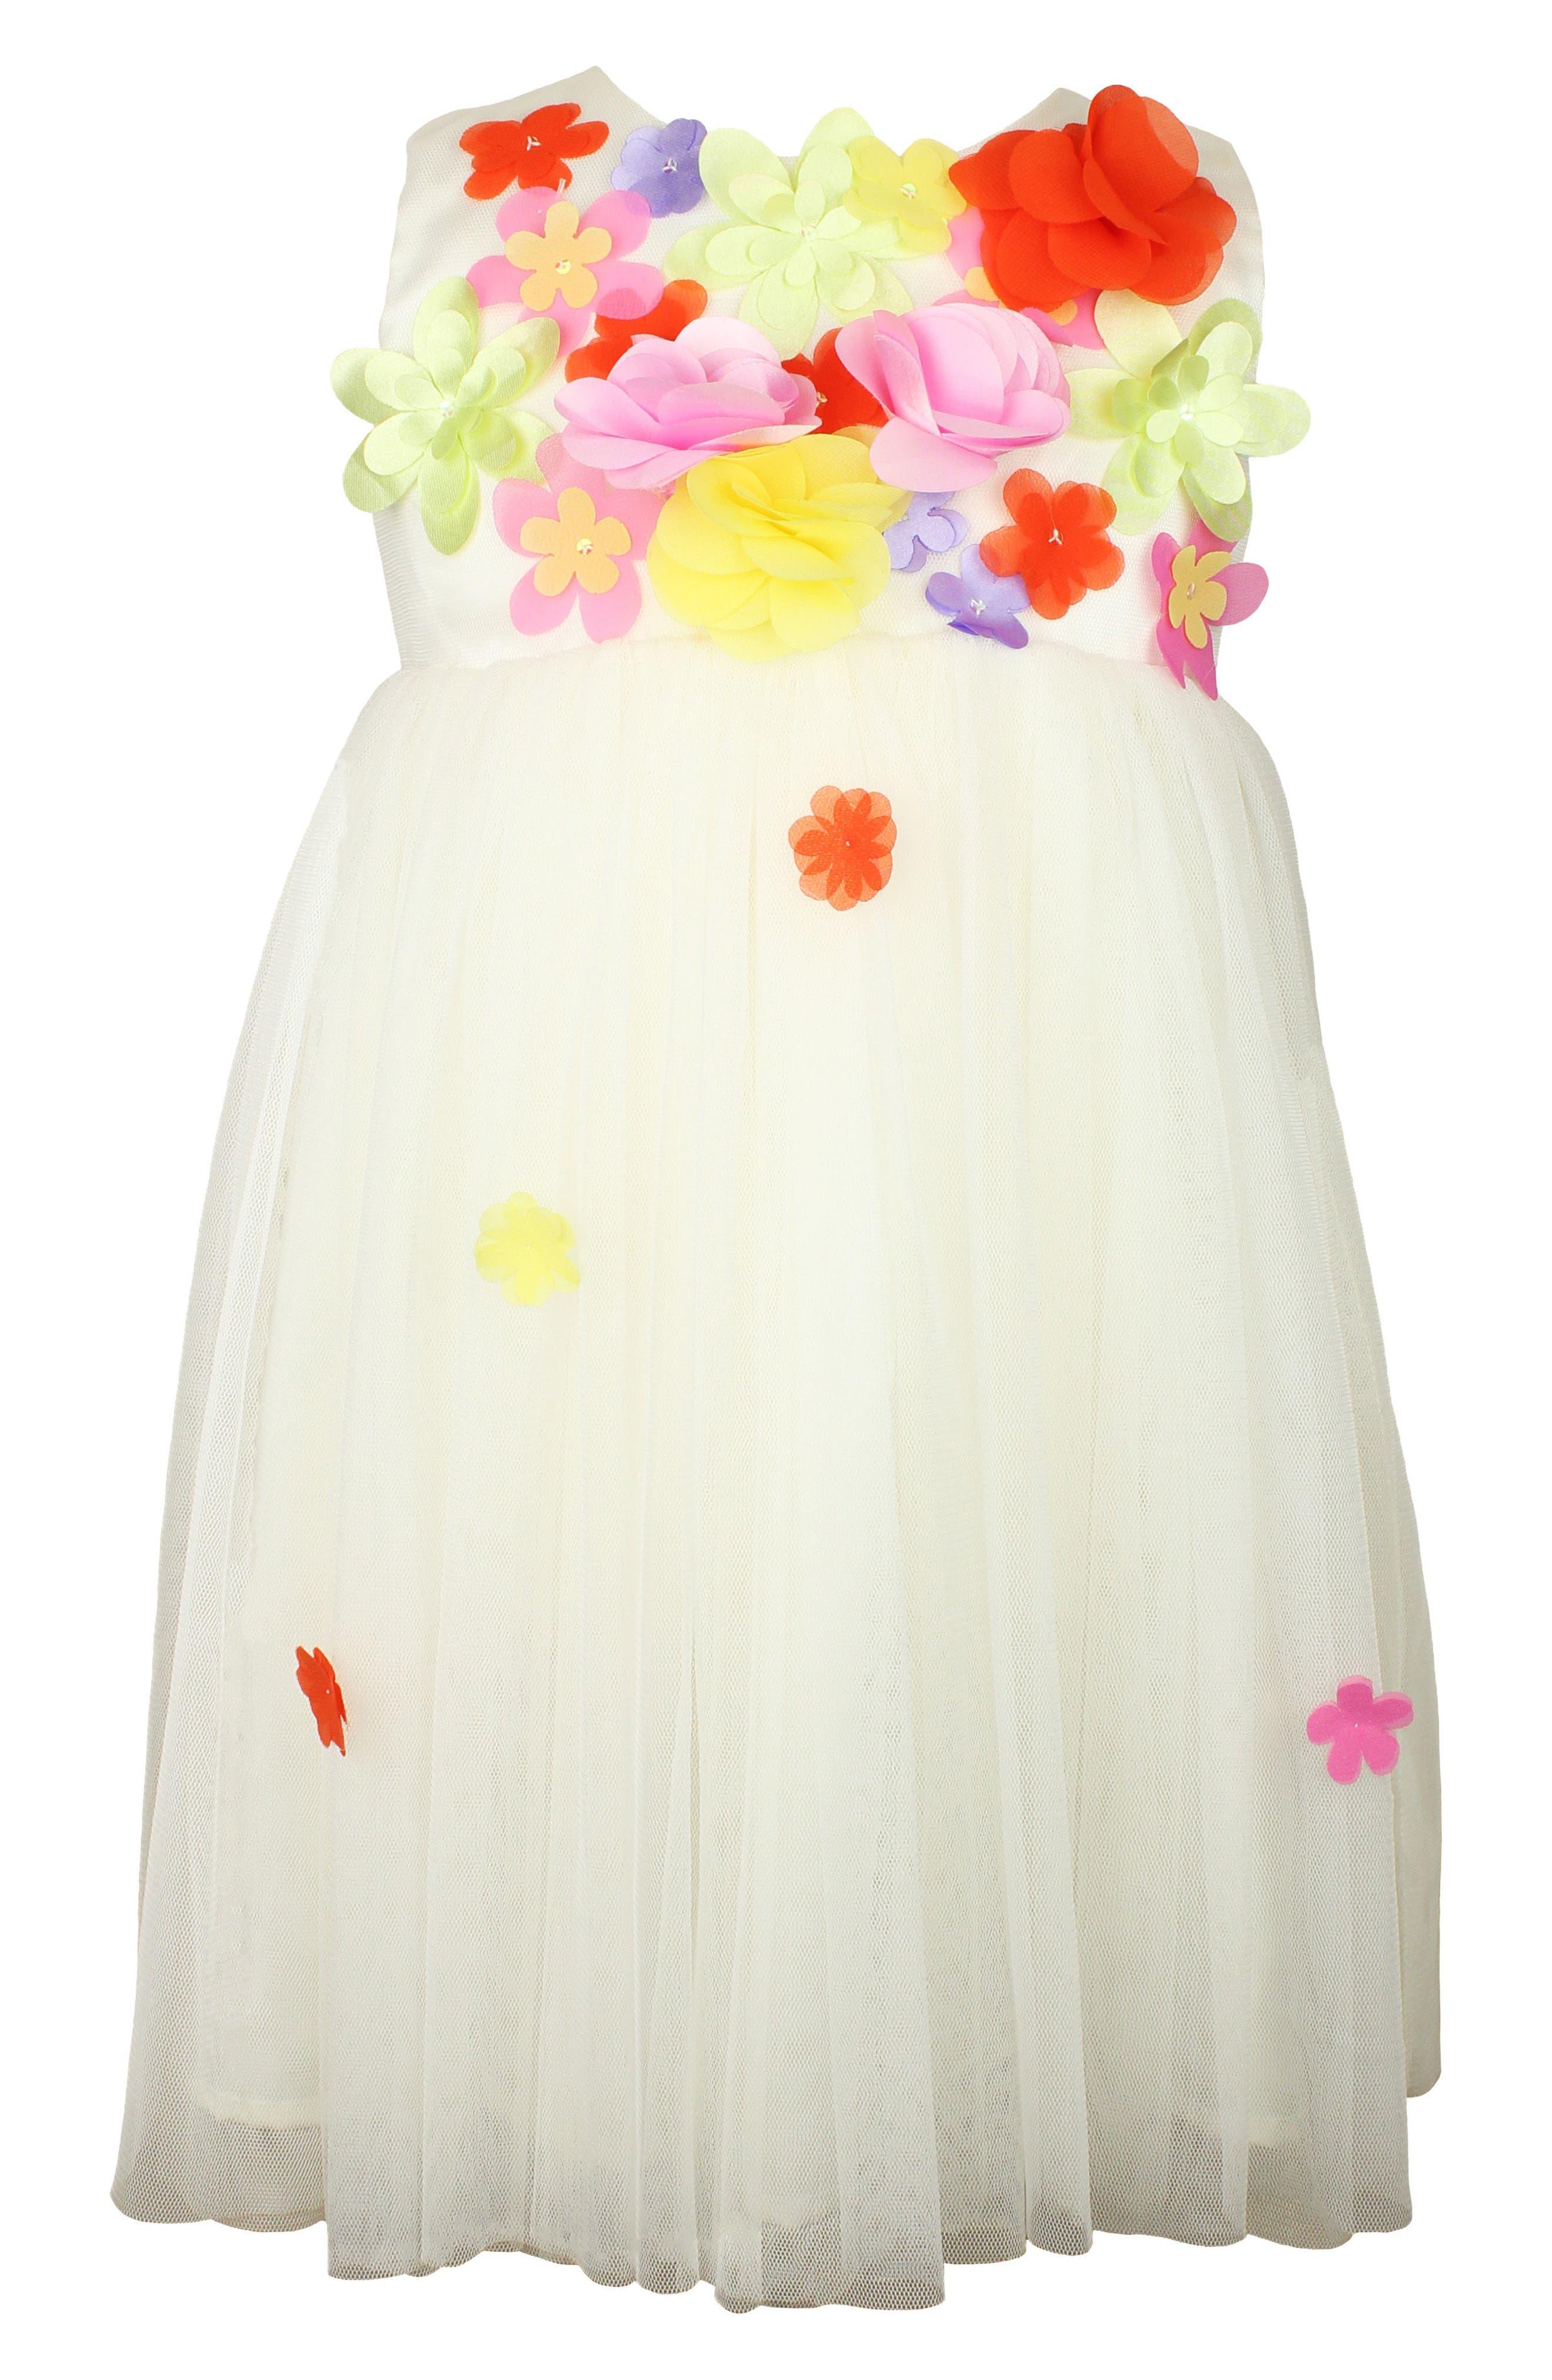 Alternate Image 1 Selected - Popatu Floral Sleeveless Dress (Baby Girls)